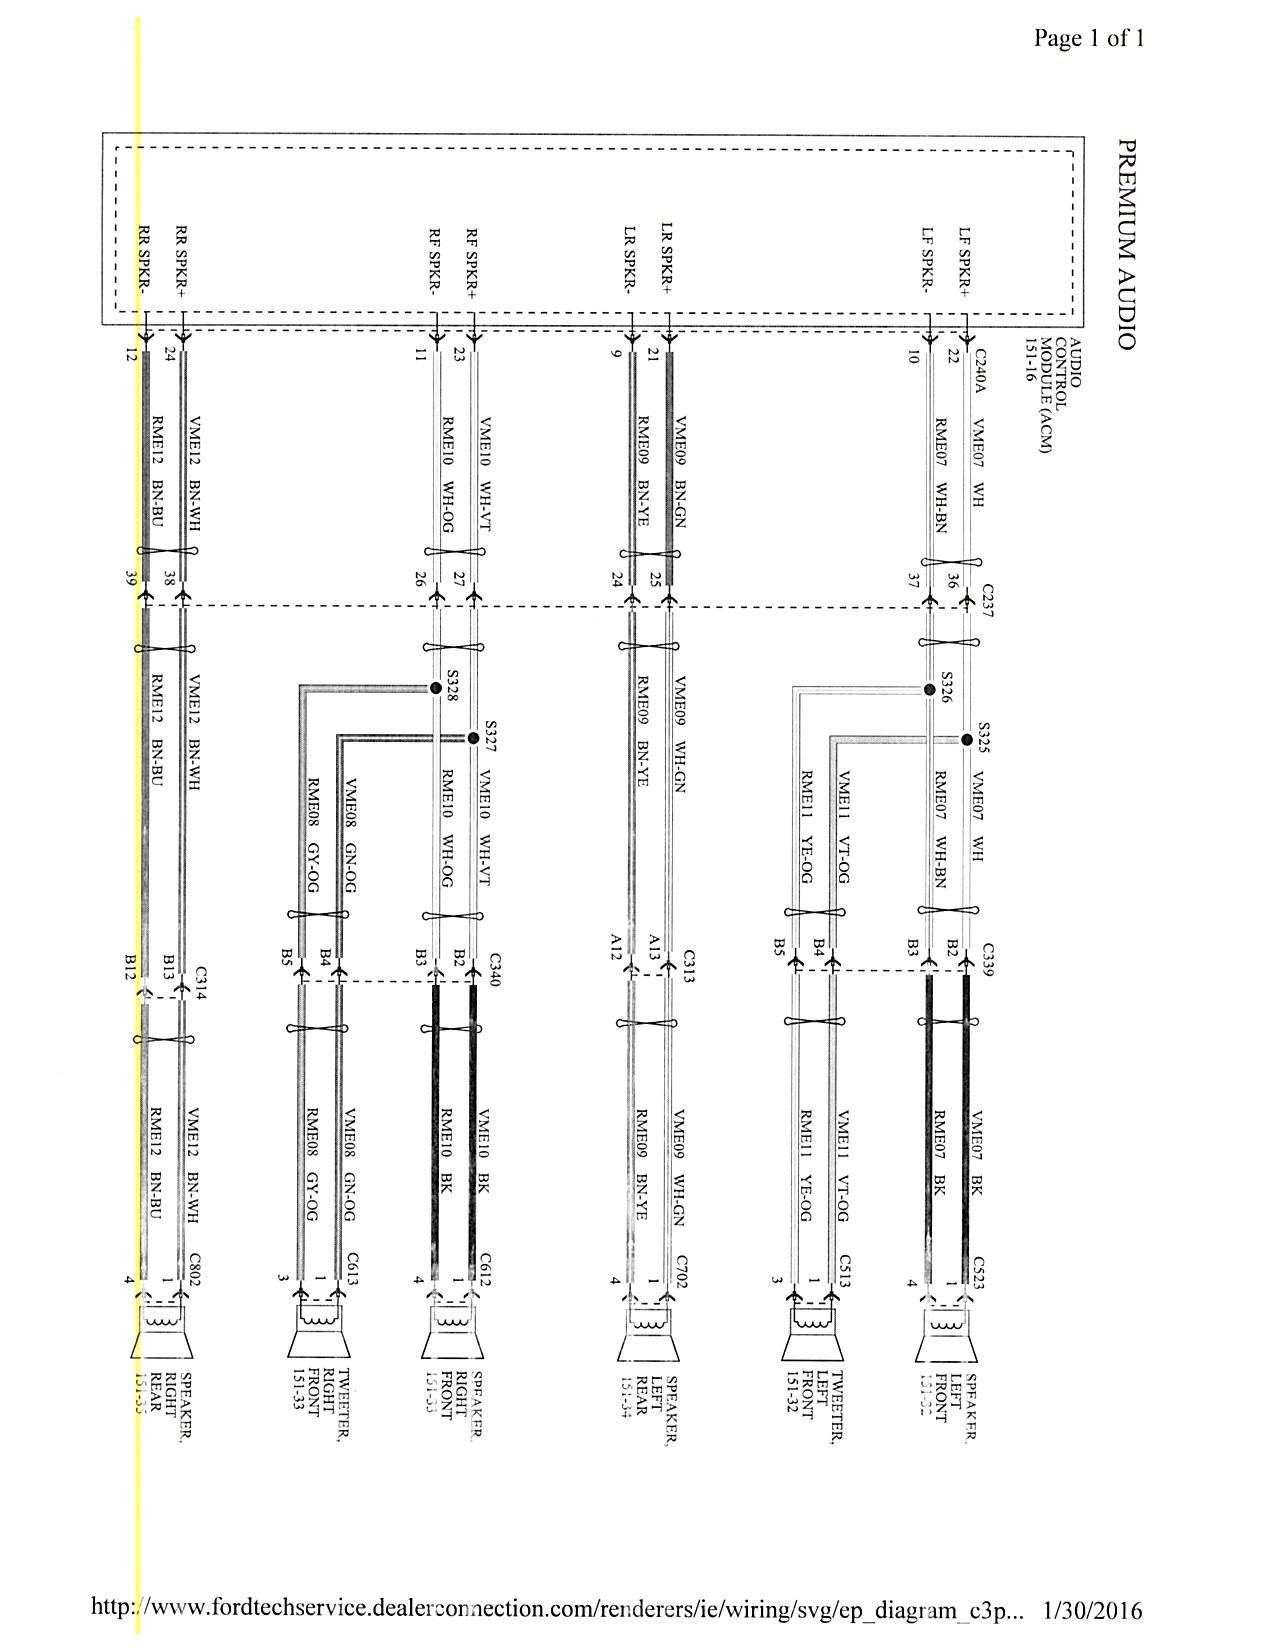 2003 ford Focus Wiring Diagram 2003 Nissan Maxima Wiring Diagram – Bigapp Of 2003 ford Focus Wiring Diagram